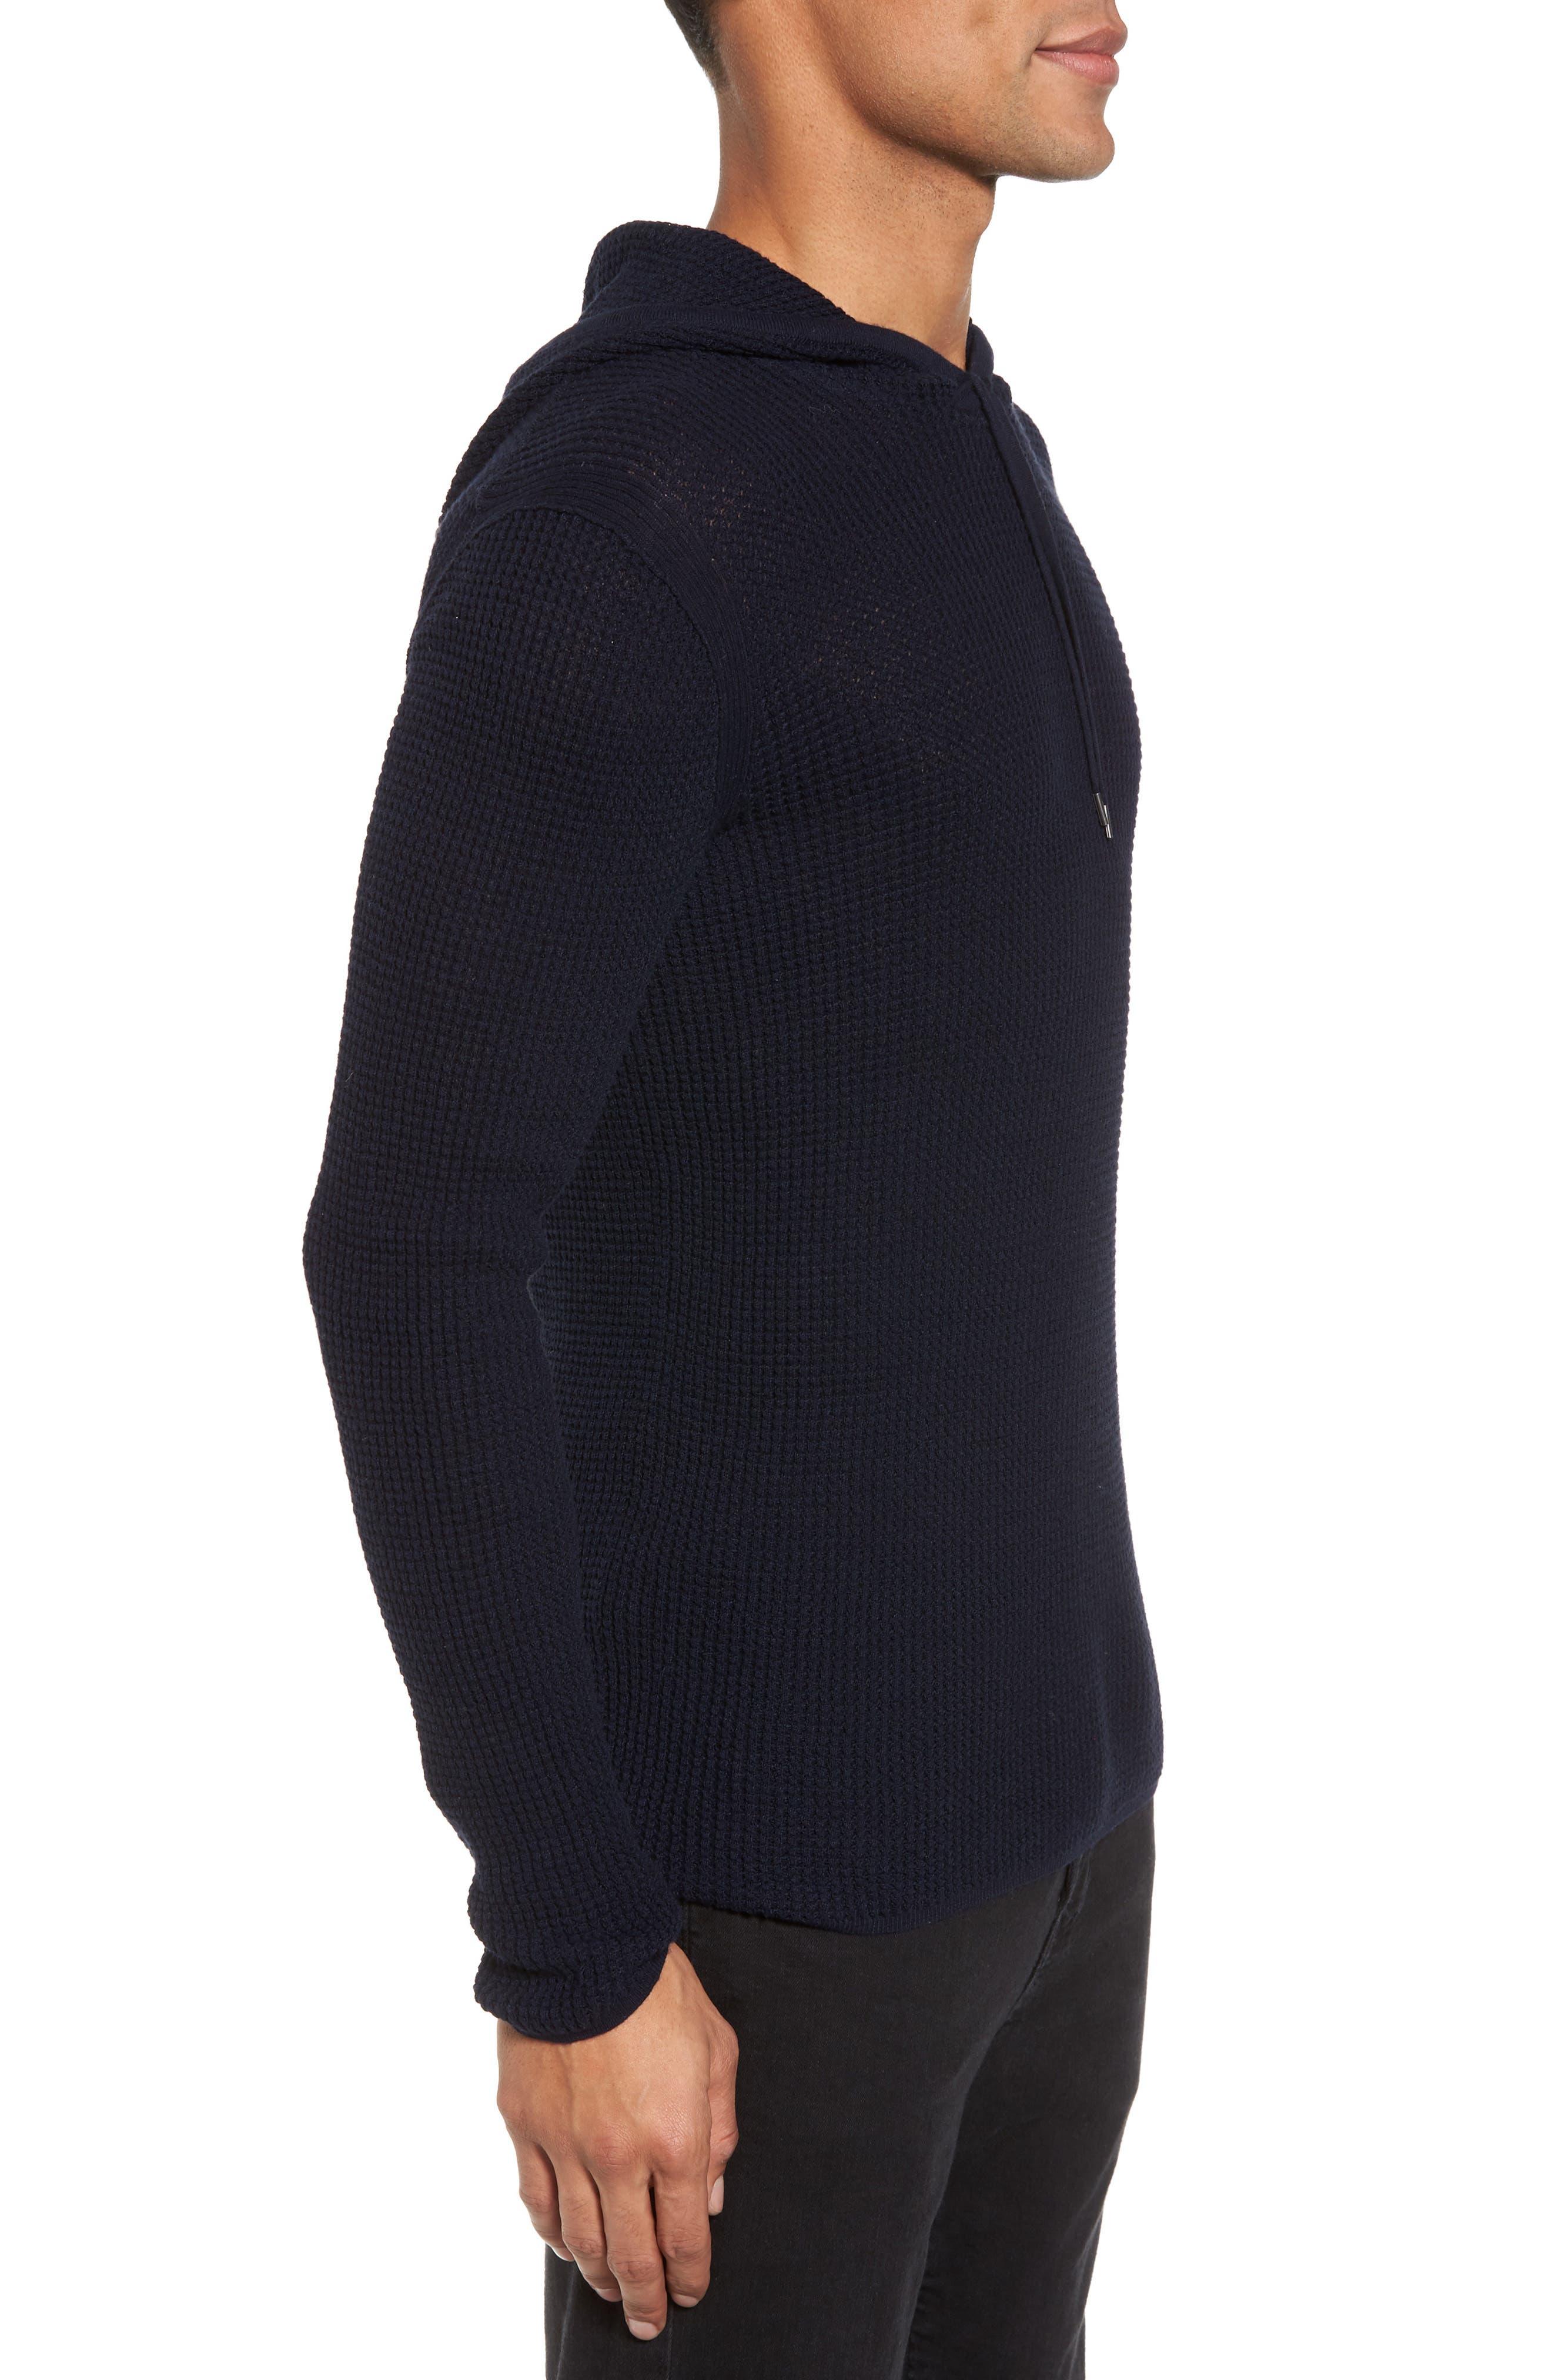 Thermal Pullover Hoodie,                             Alternate thumbnail 3, color,                             Marine